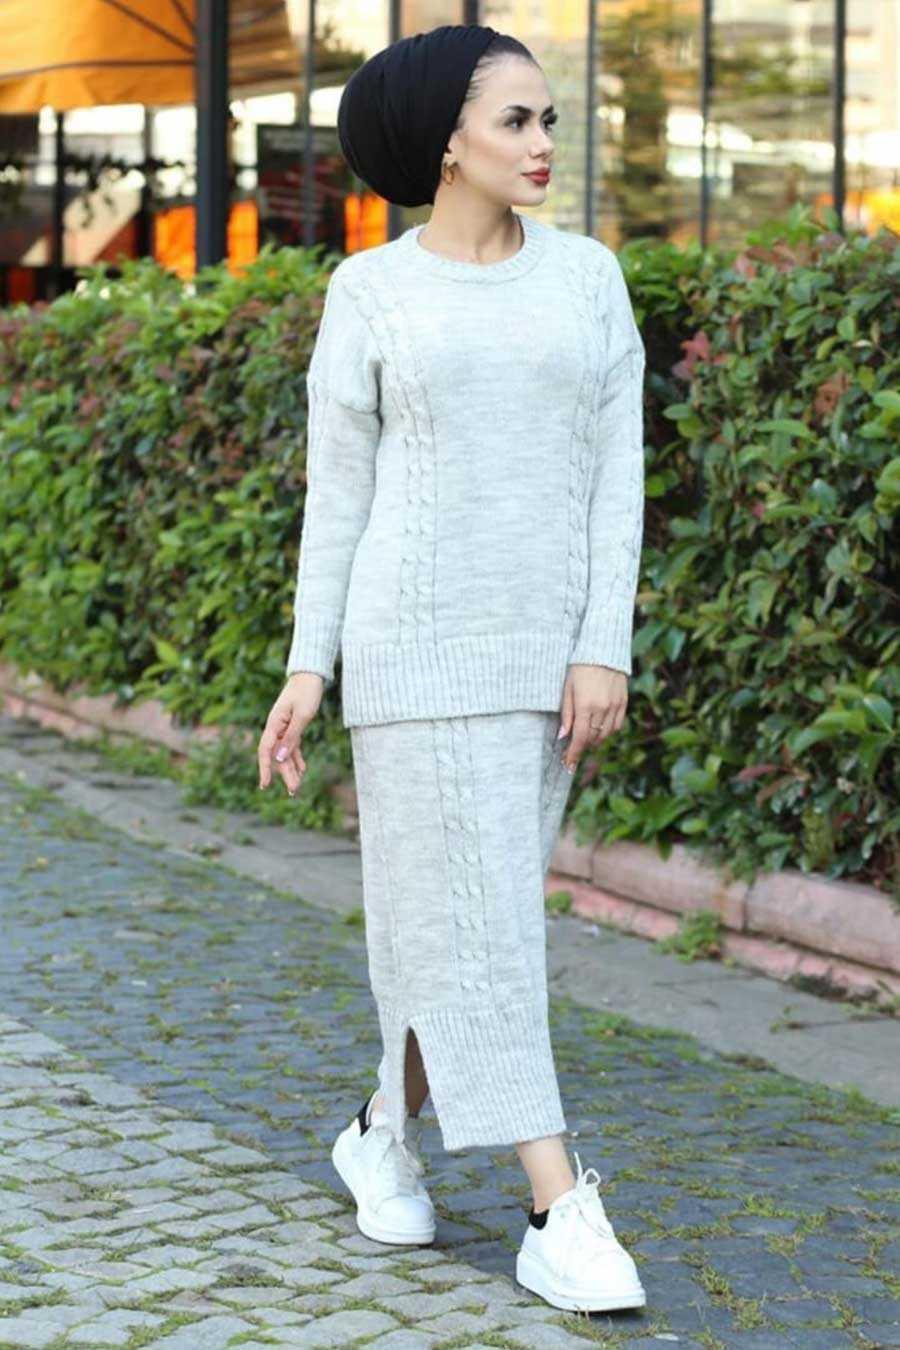 Grey Hijab Knitwear Suit 6010GR